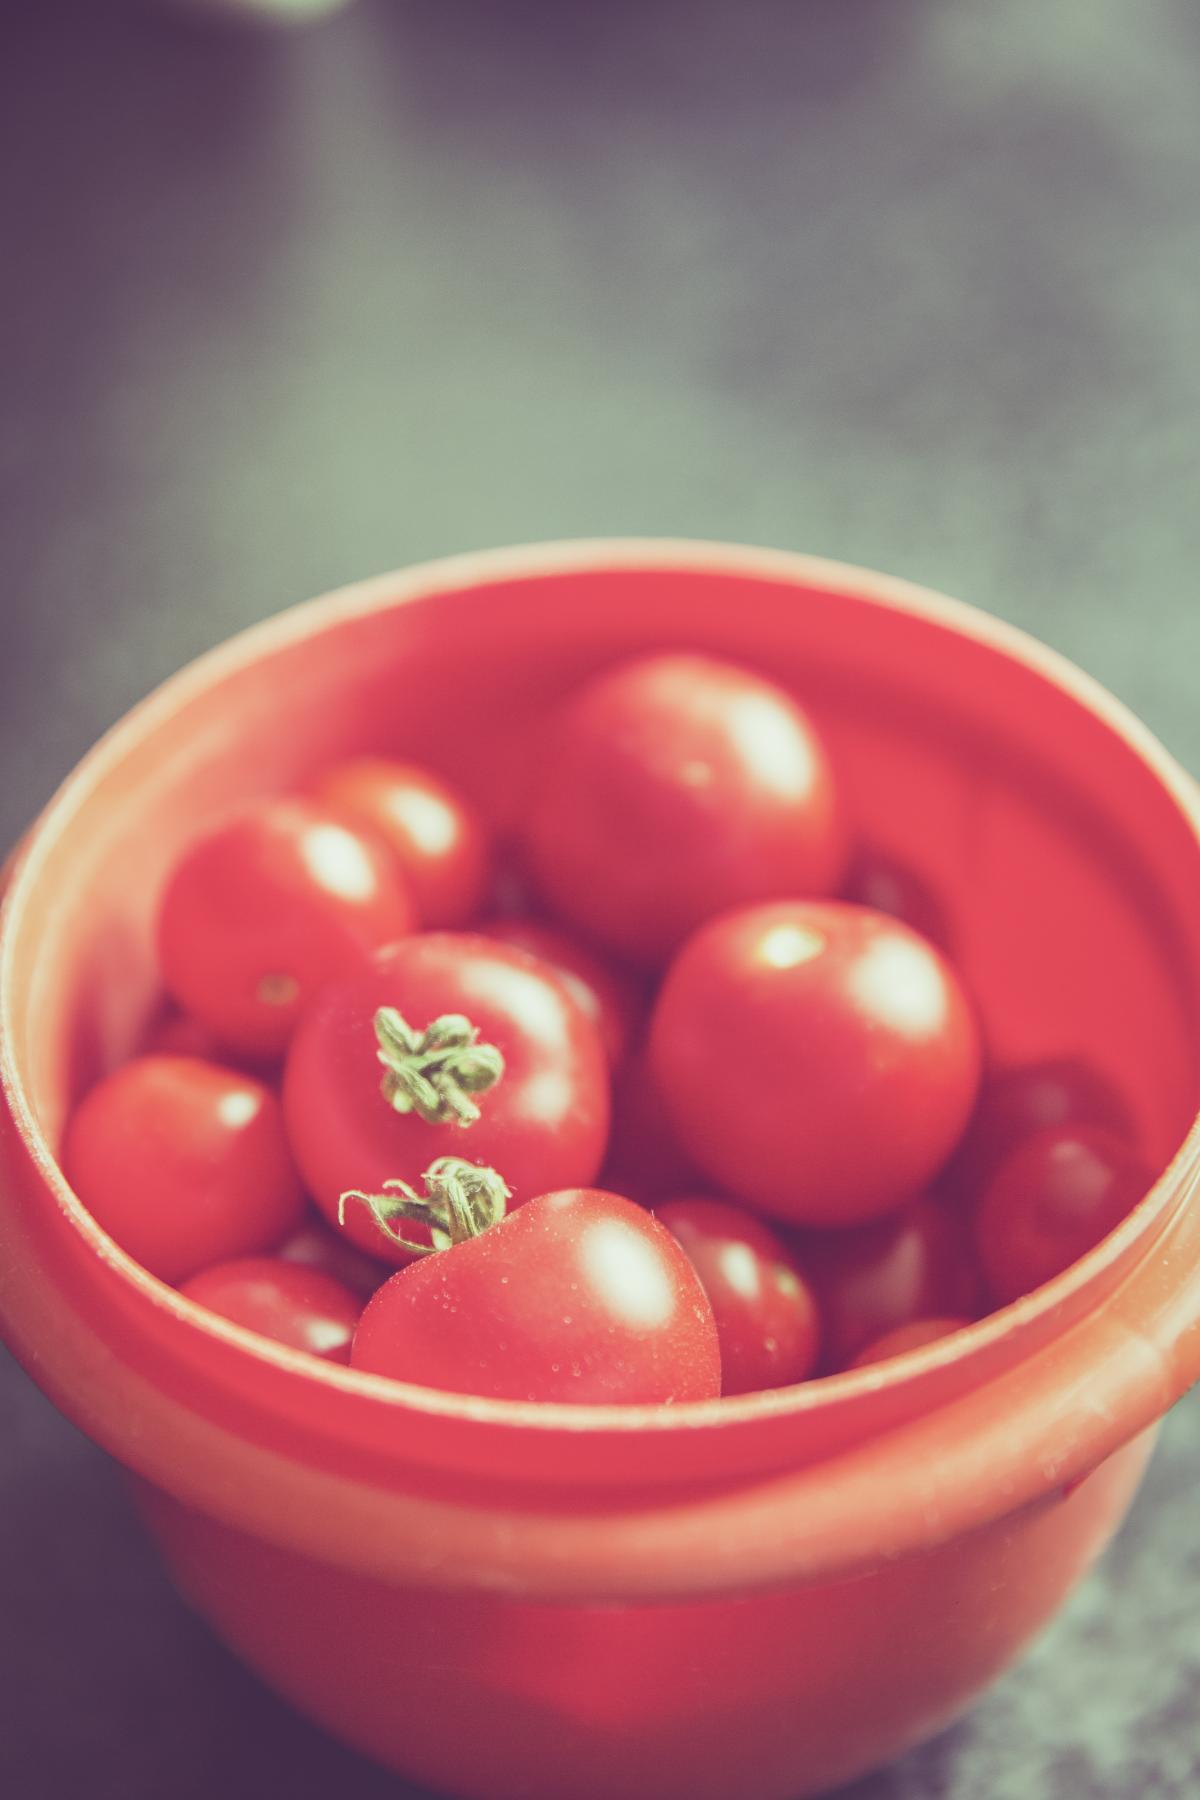 Red Tomato on Orange Round Plastic Container